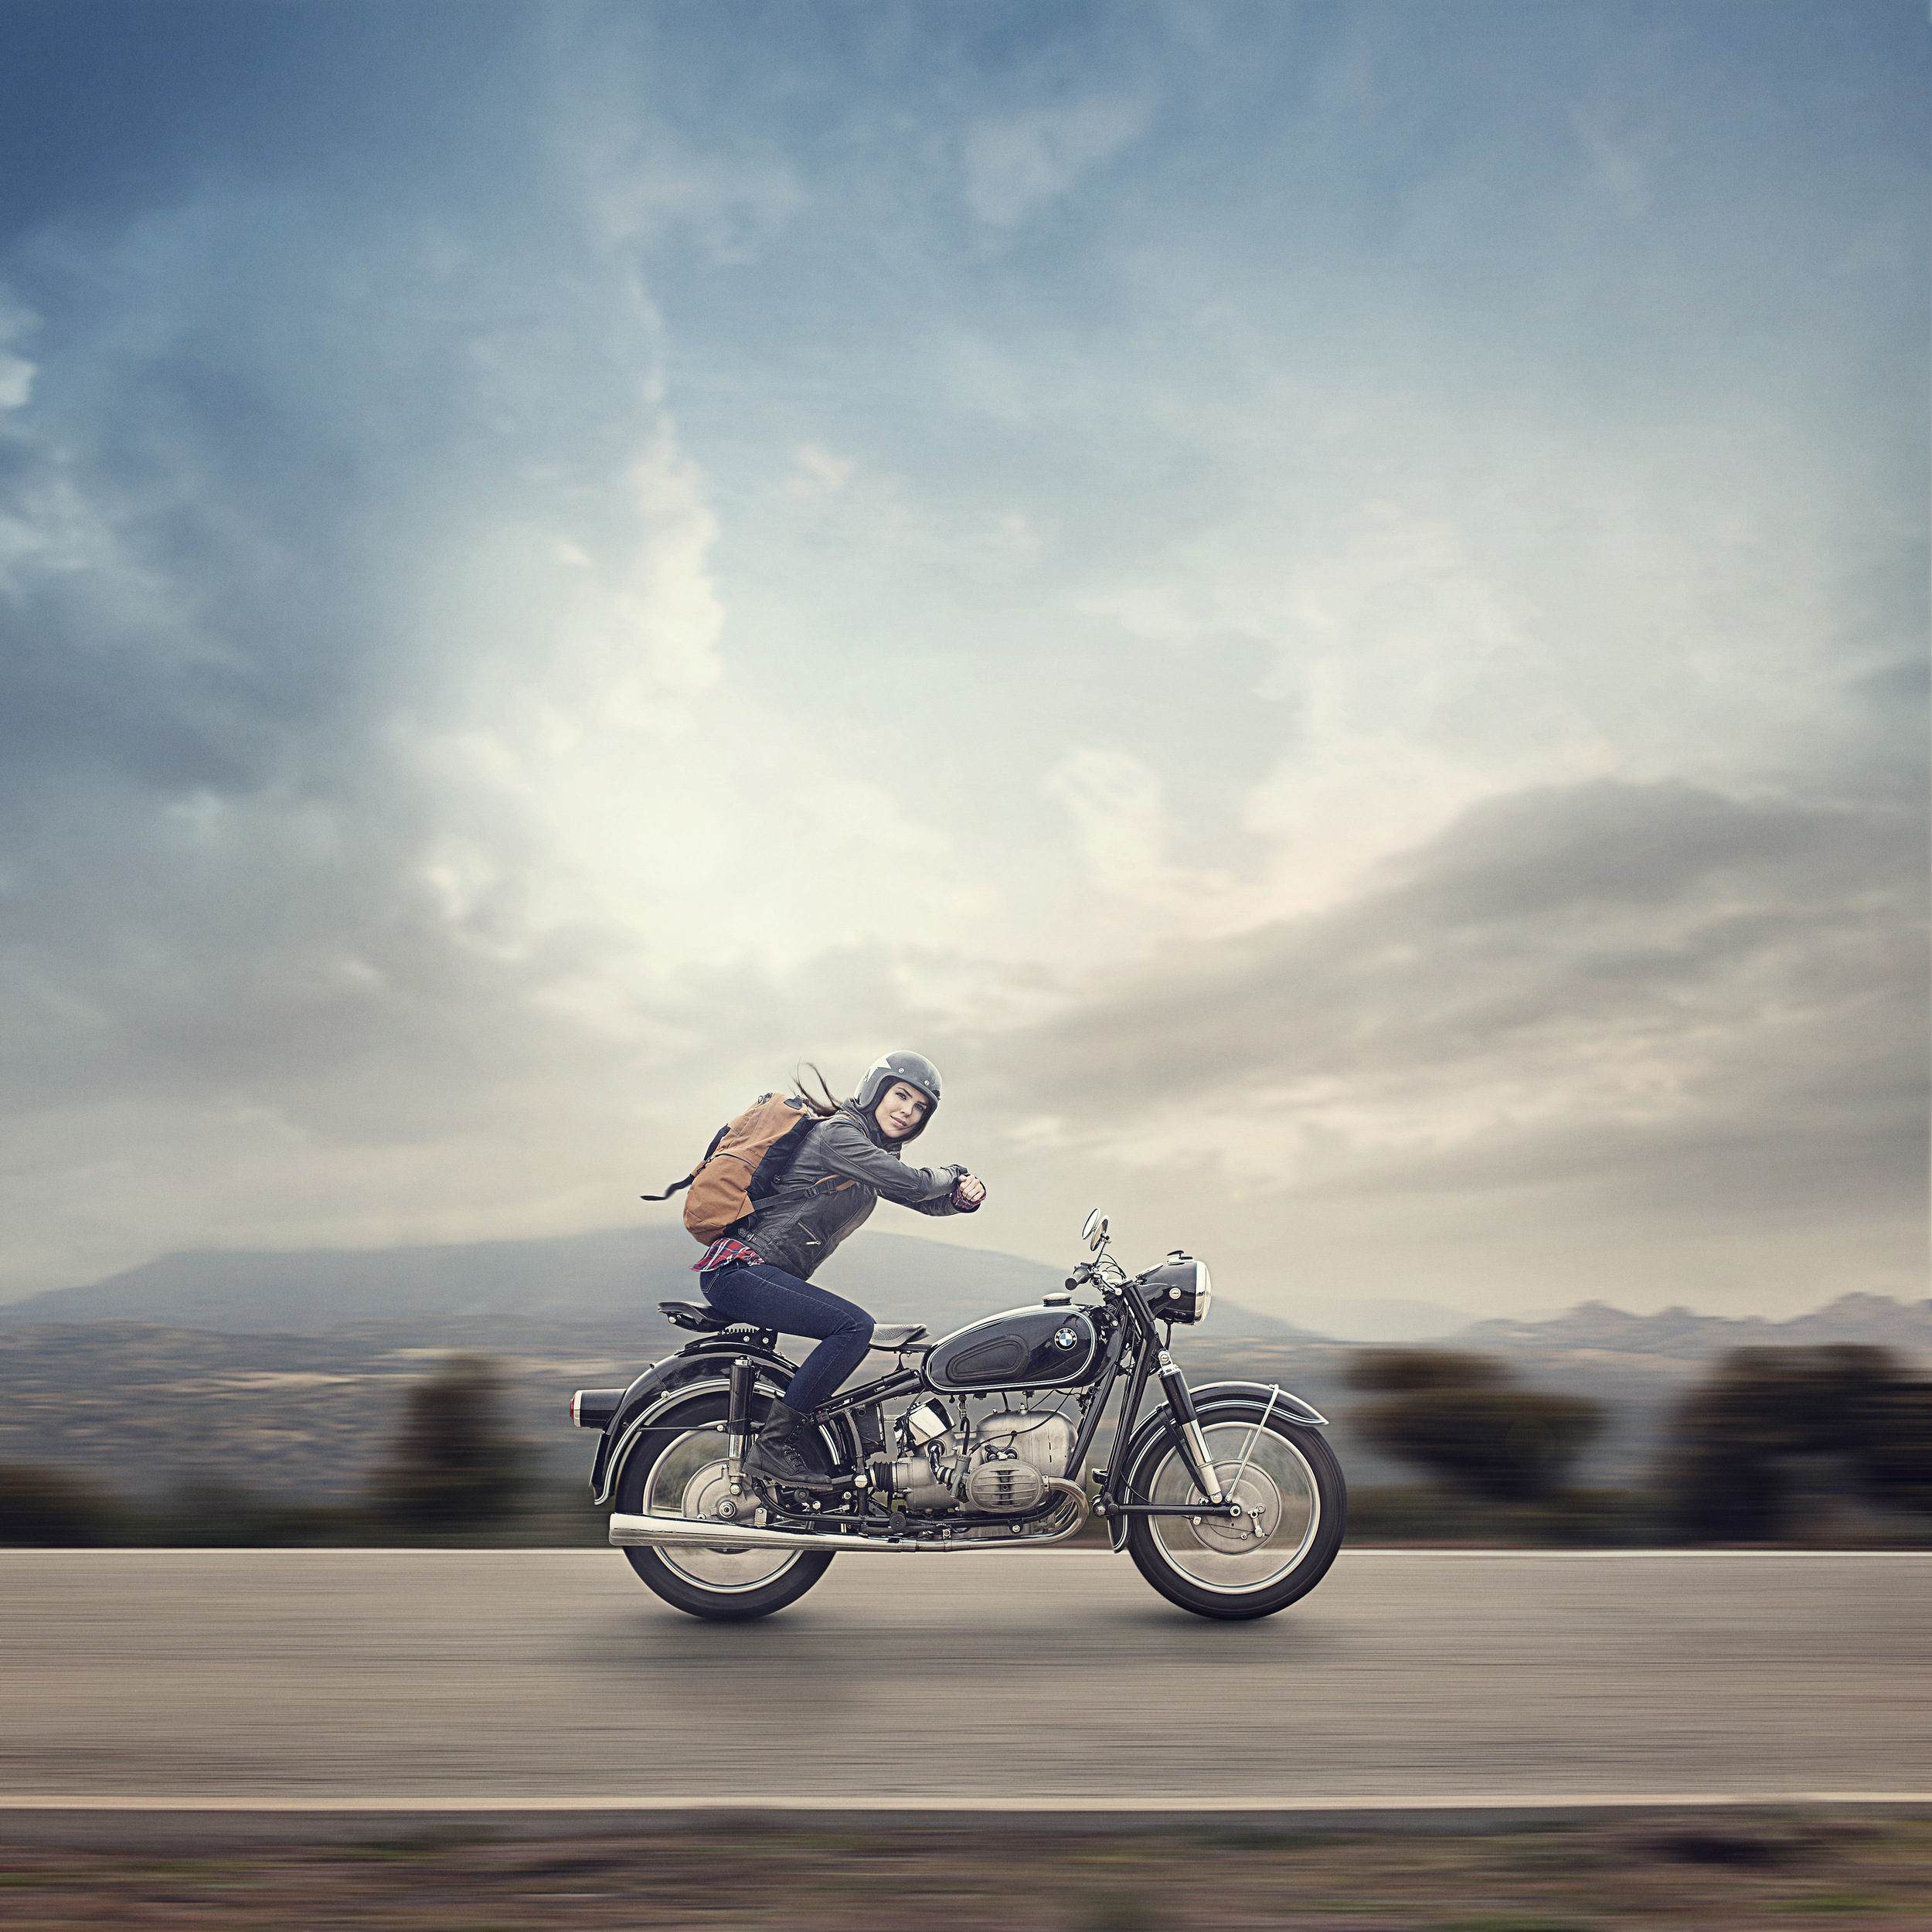 Moto-alta-2.1 (1).jpg